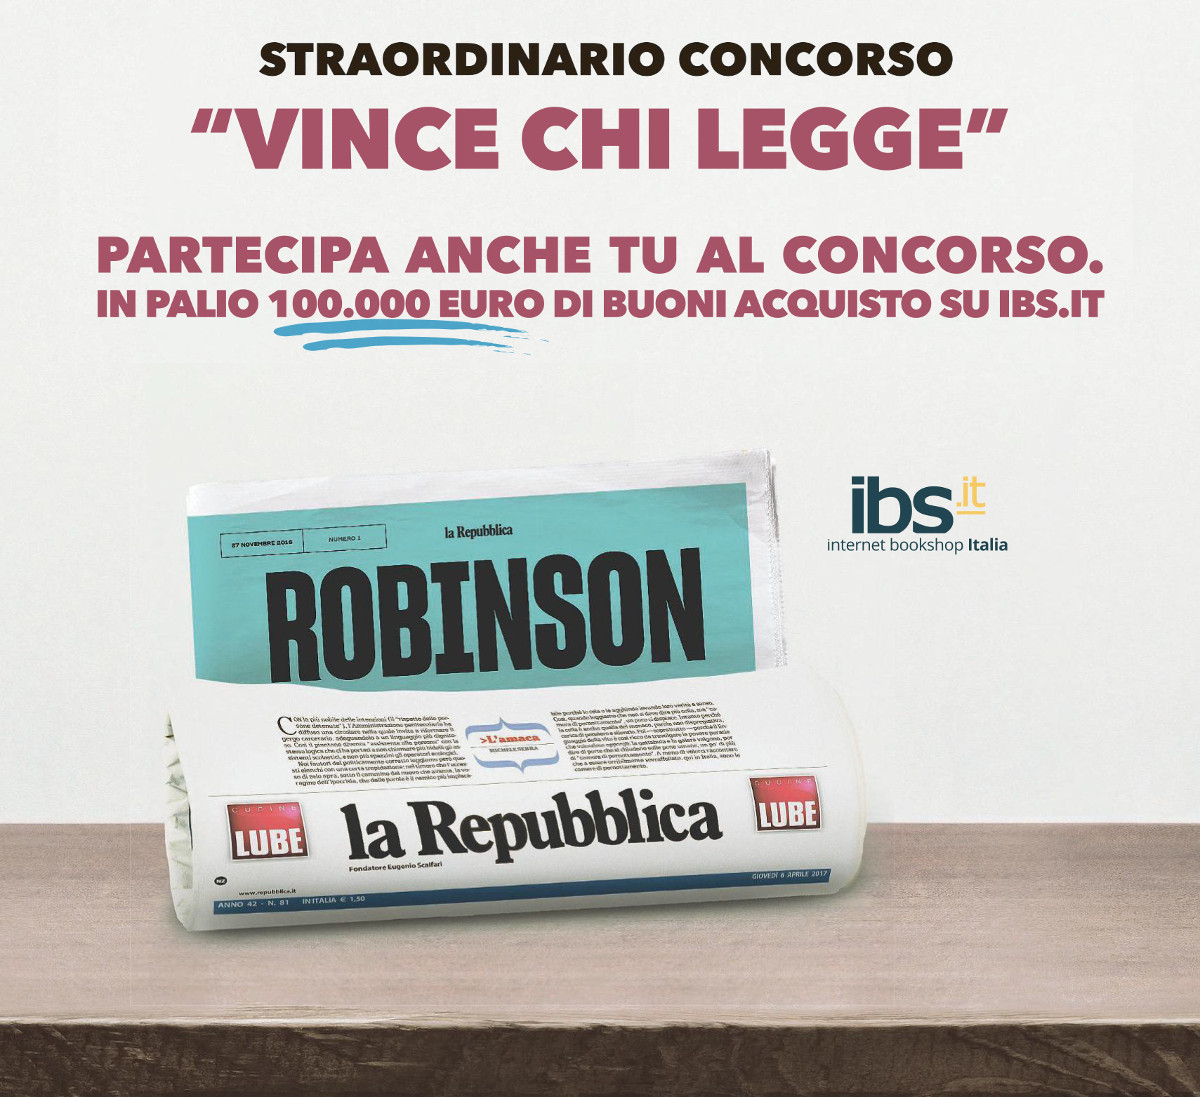 Vince chi legge Robinson